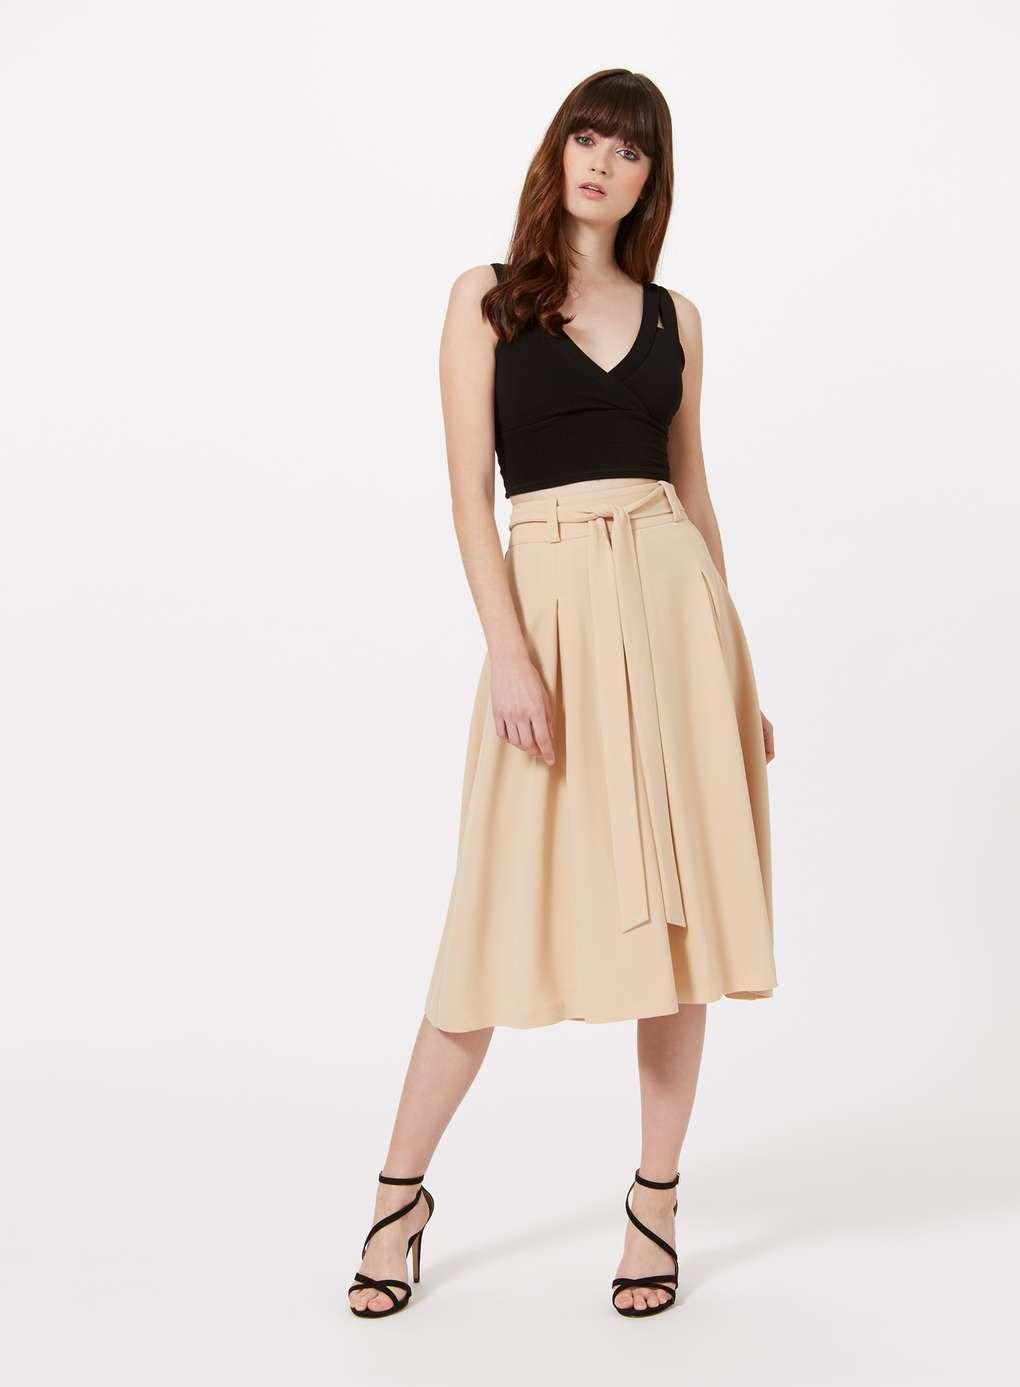 bd7f26984 Camel Tie Waist Midi Skirt. - Shorts and Skirts | Girl | Skirts ...